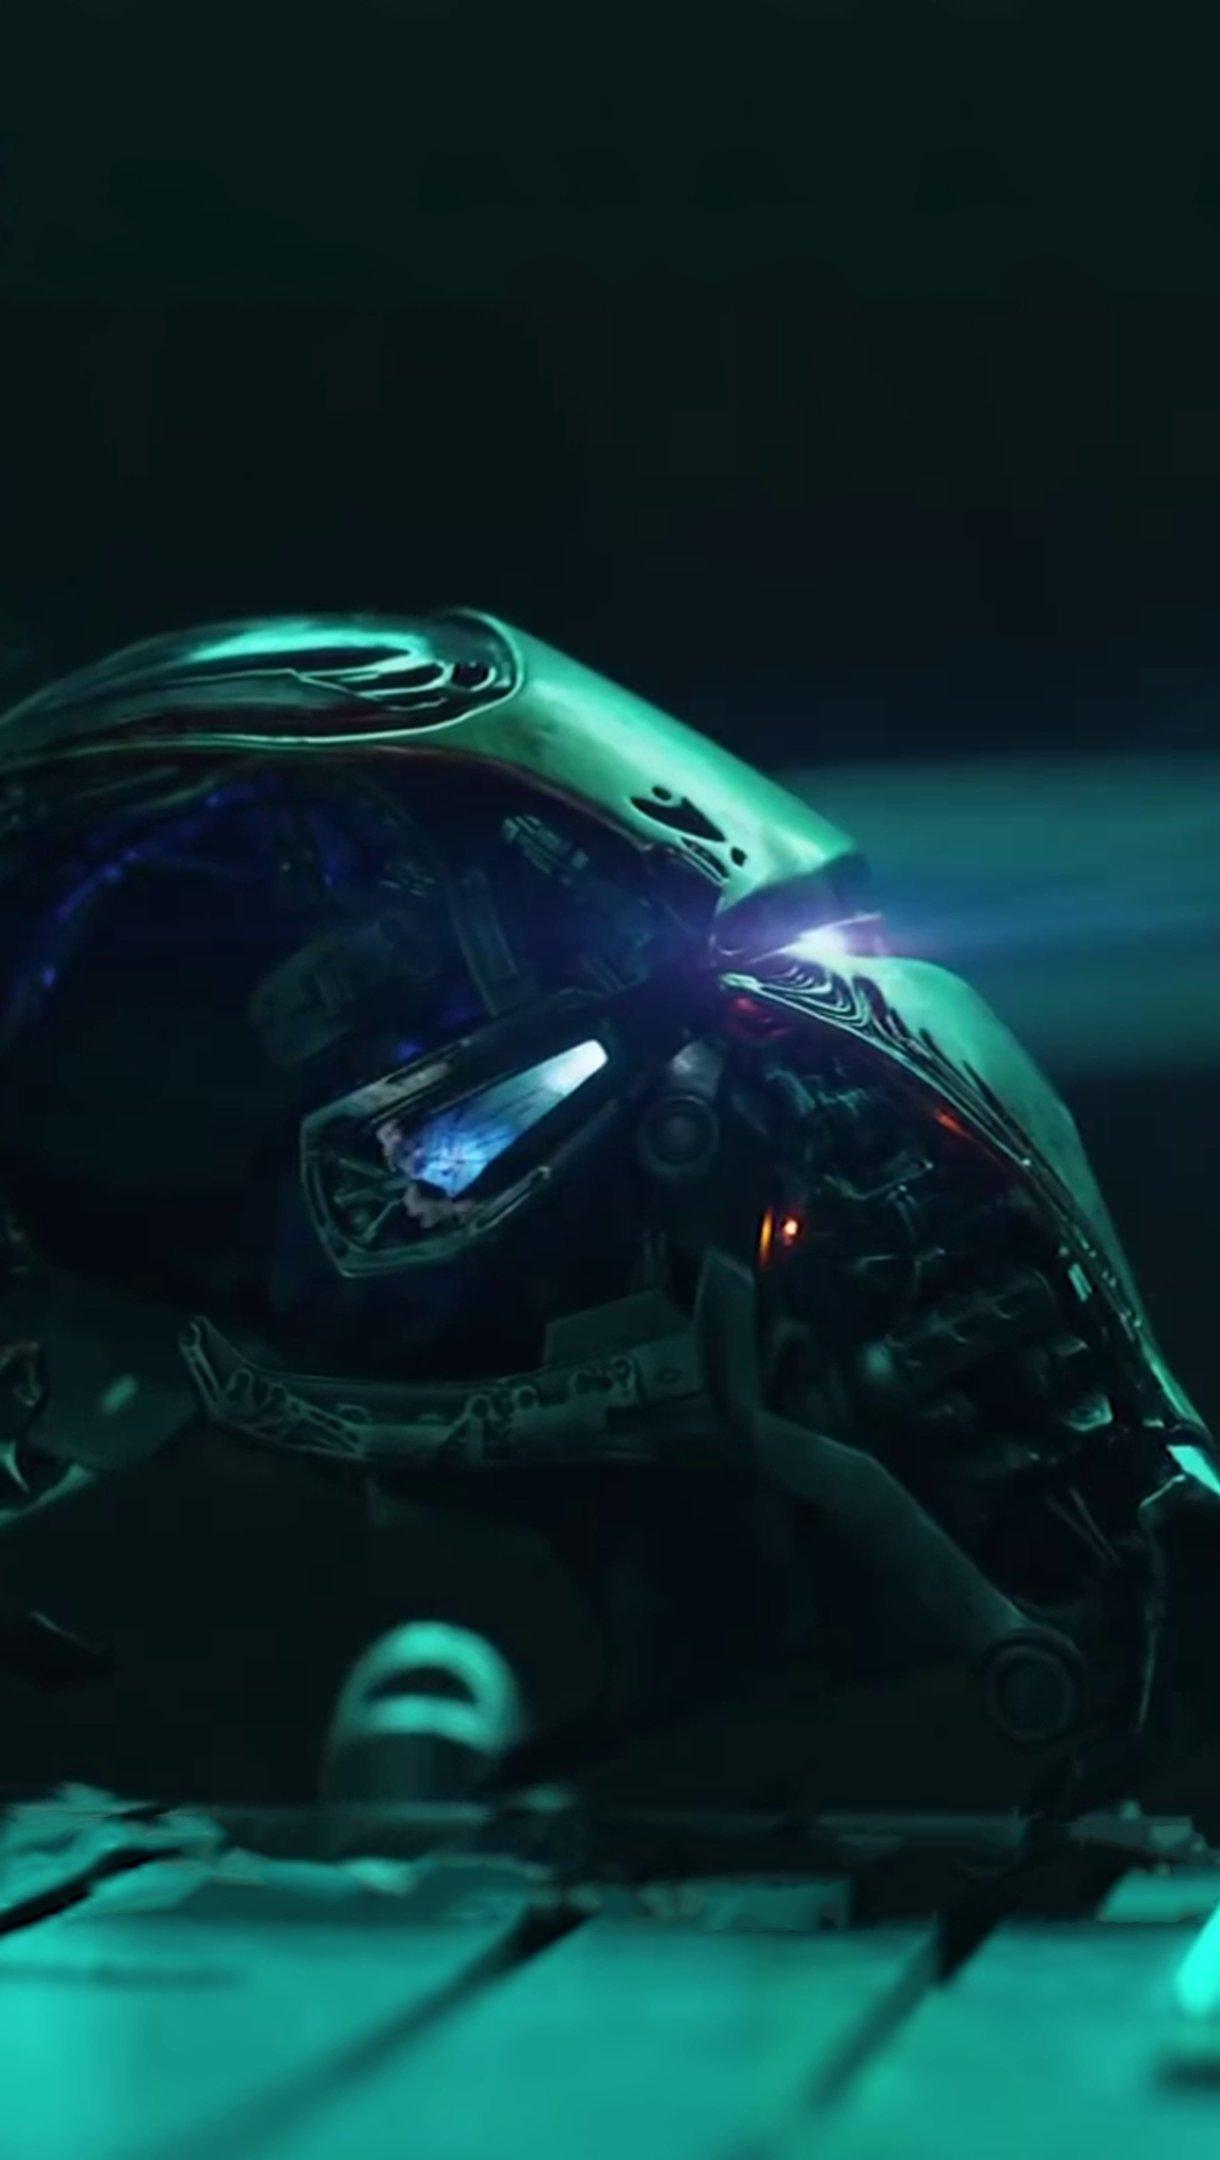 Wallpaper Iron Man Endgame Vertical